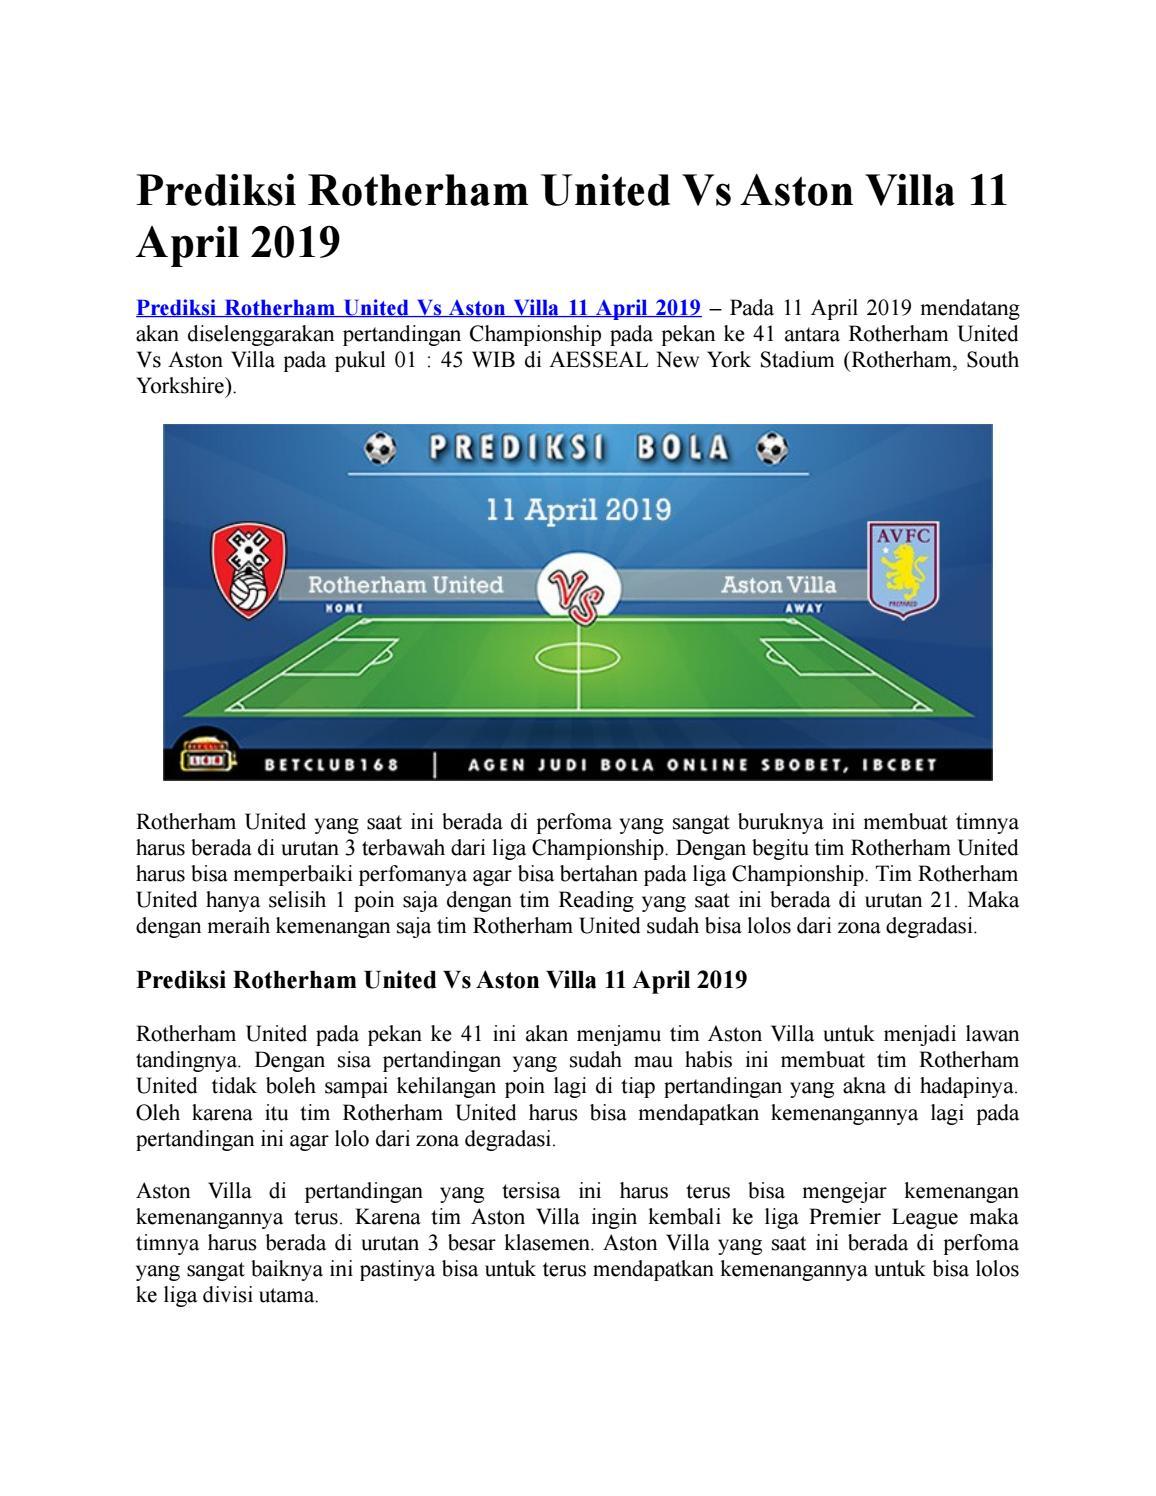 Aston Villa Klasemen Aston Villa News Now